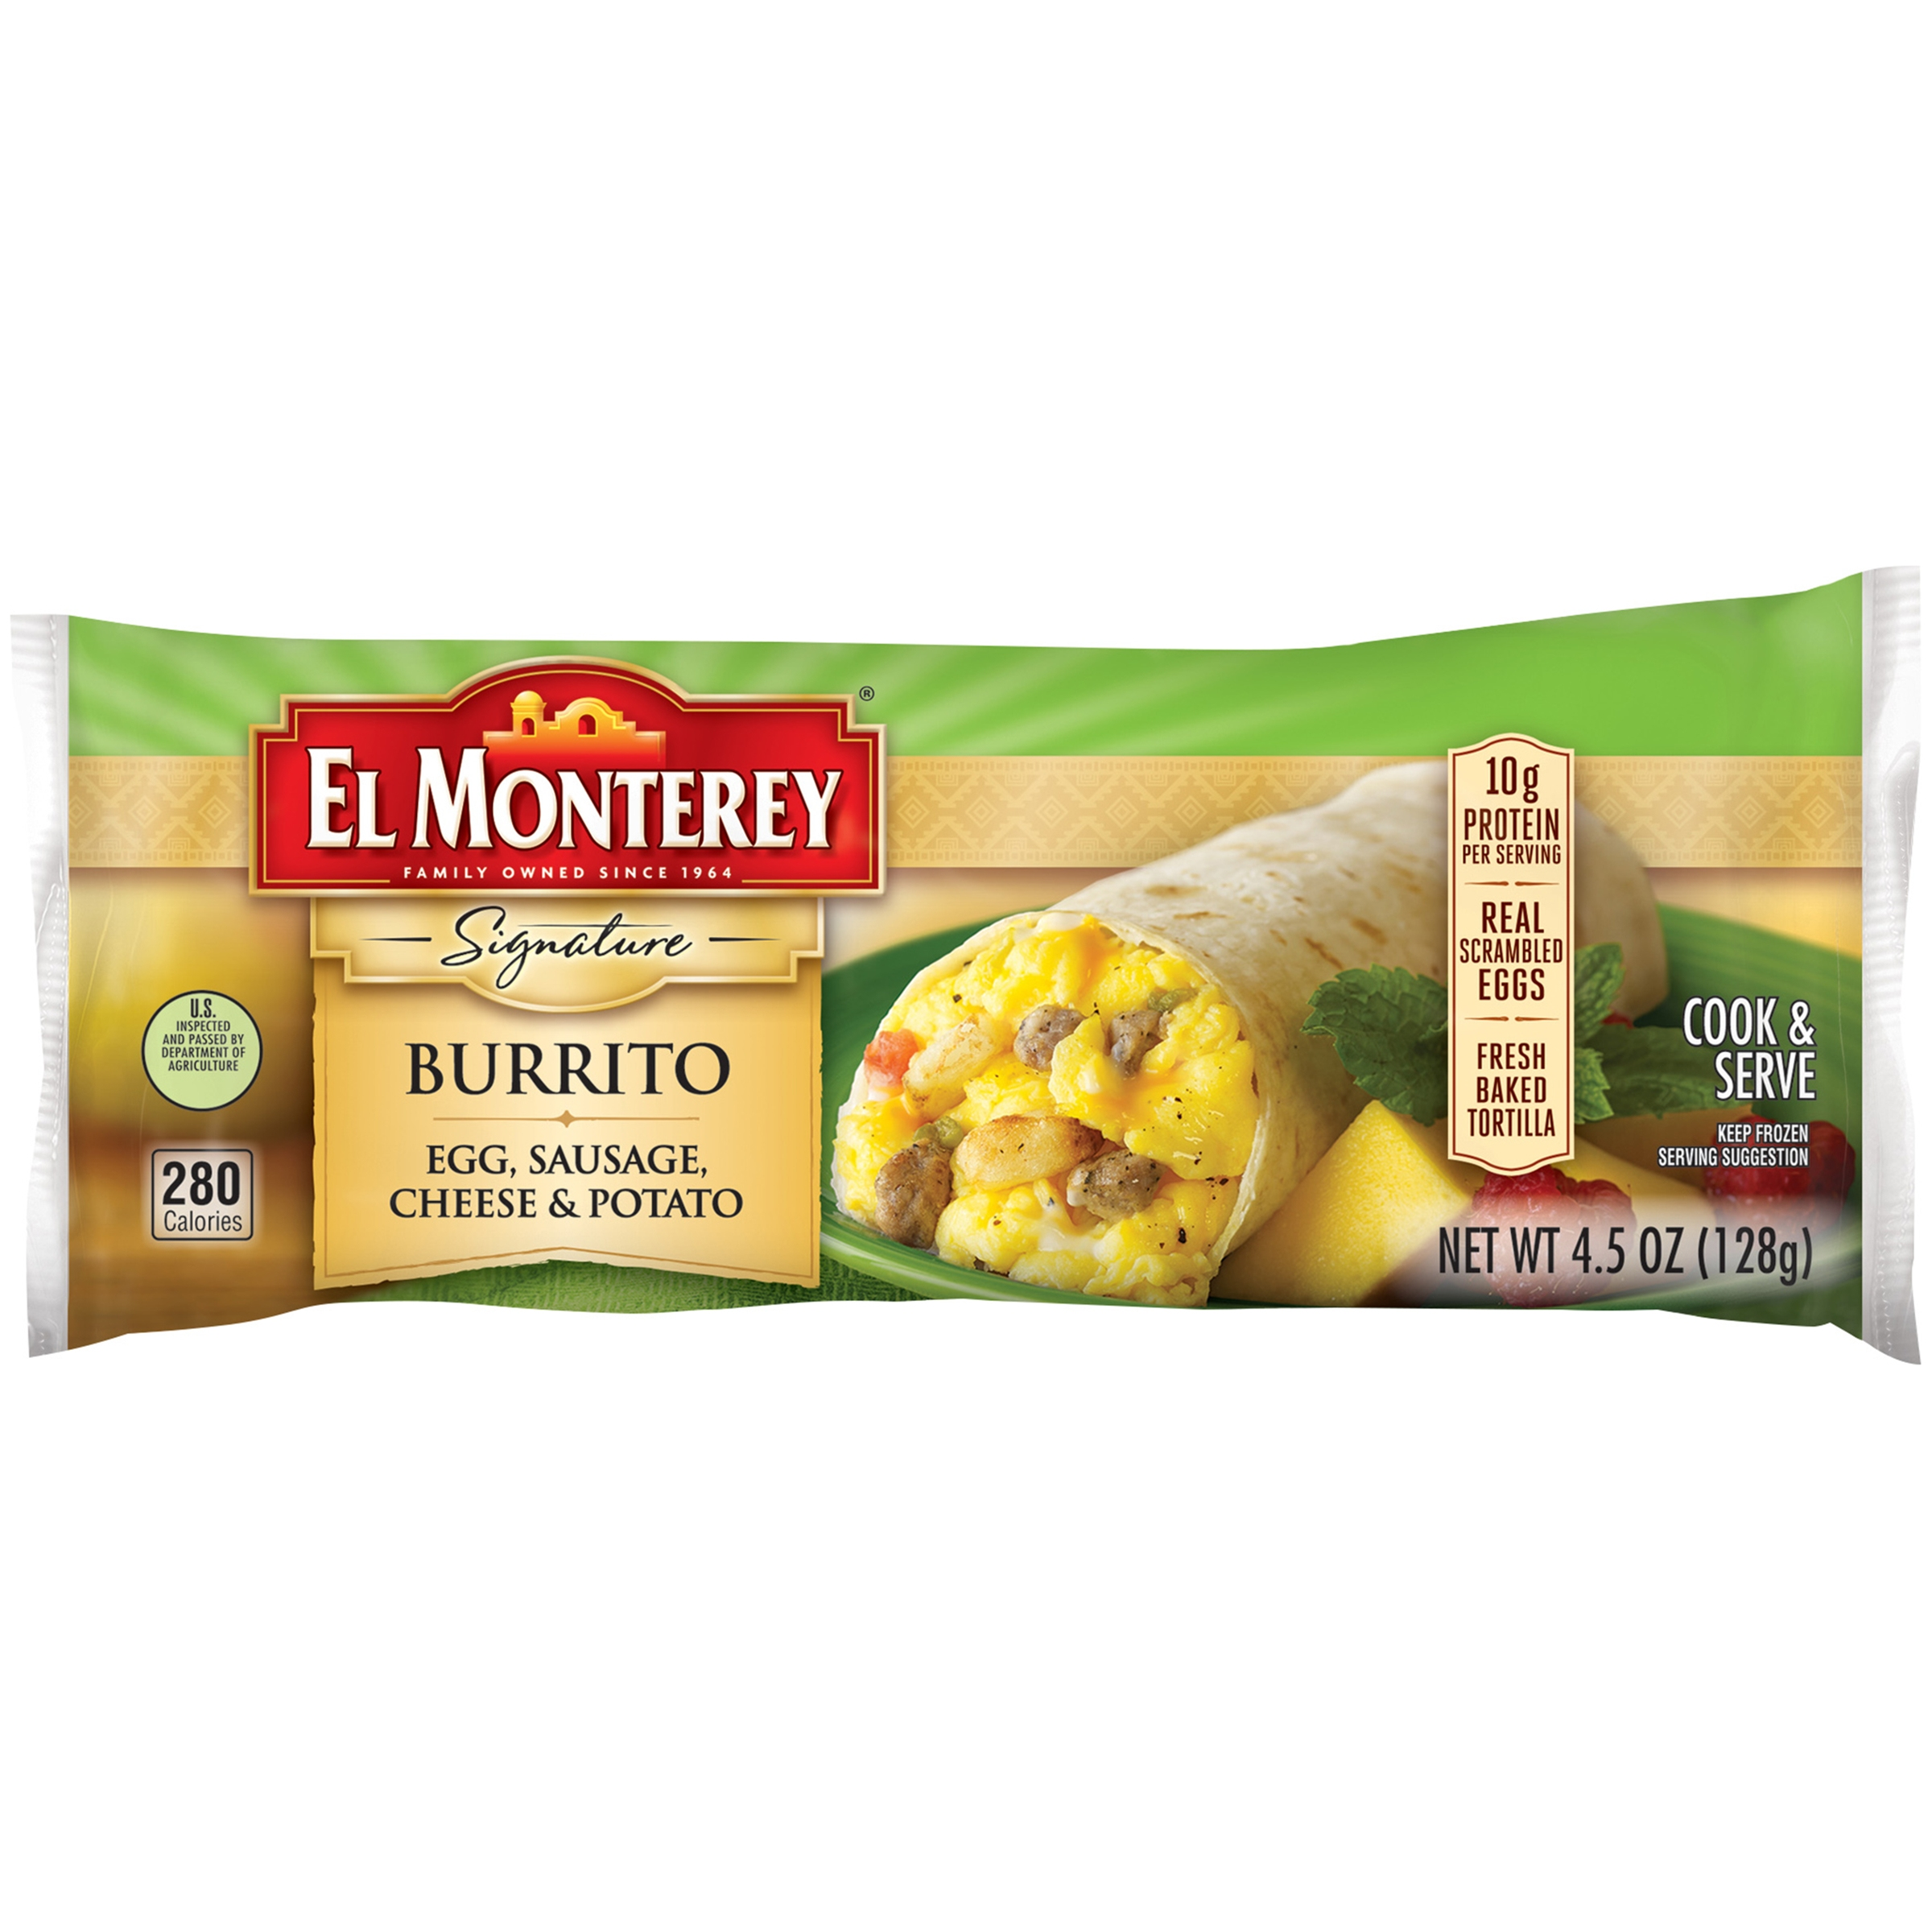 El Monterey® Signature Egg, Sausage, Cheese & Potato Burrito 4.5 oz. Bag